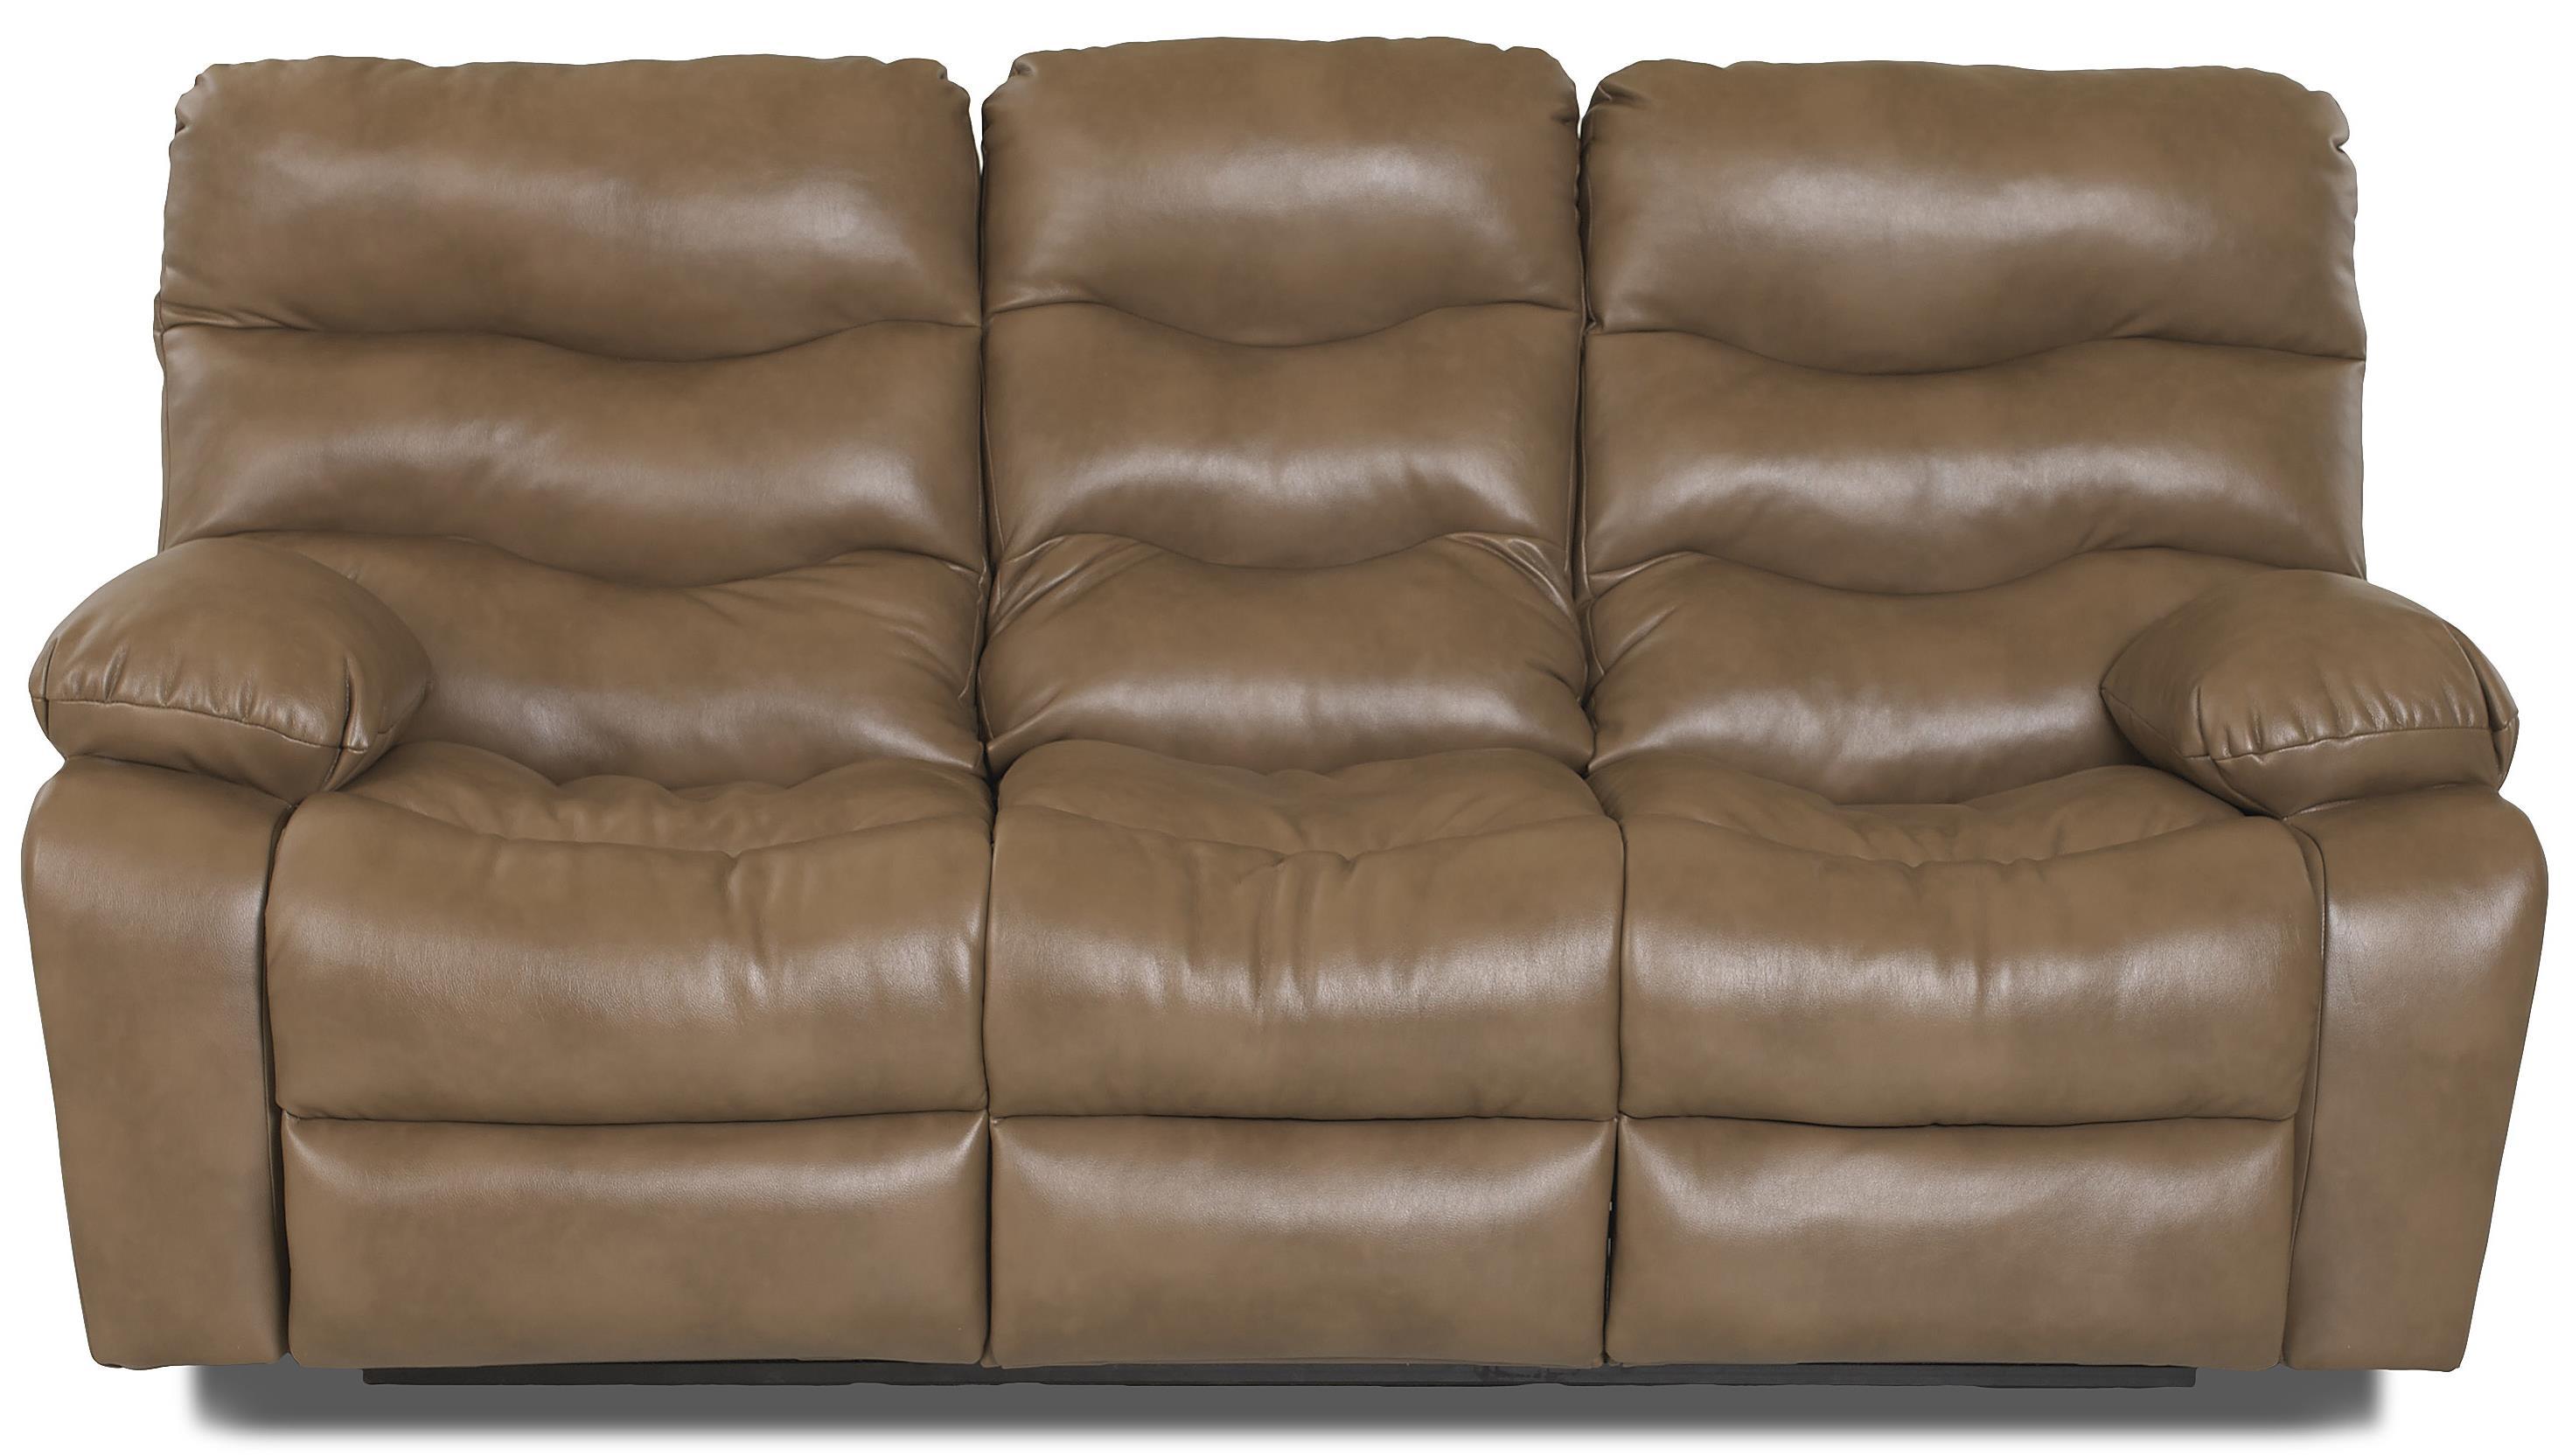 Klaussner Hercules Power Reclining Sofa - Item Number: 27403 PWRS-JuniperWalnut